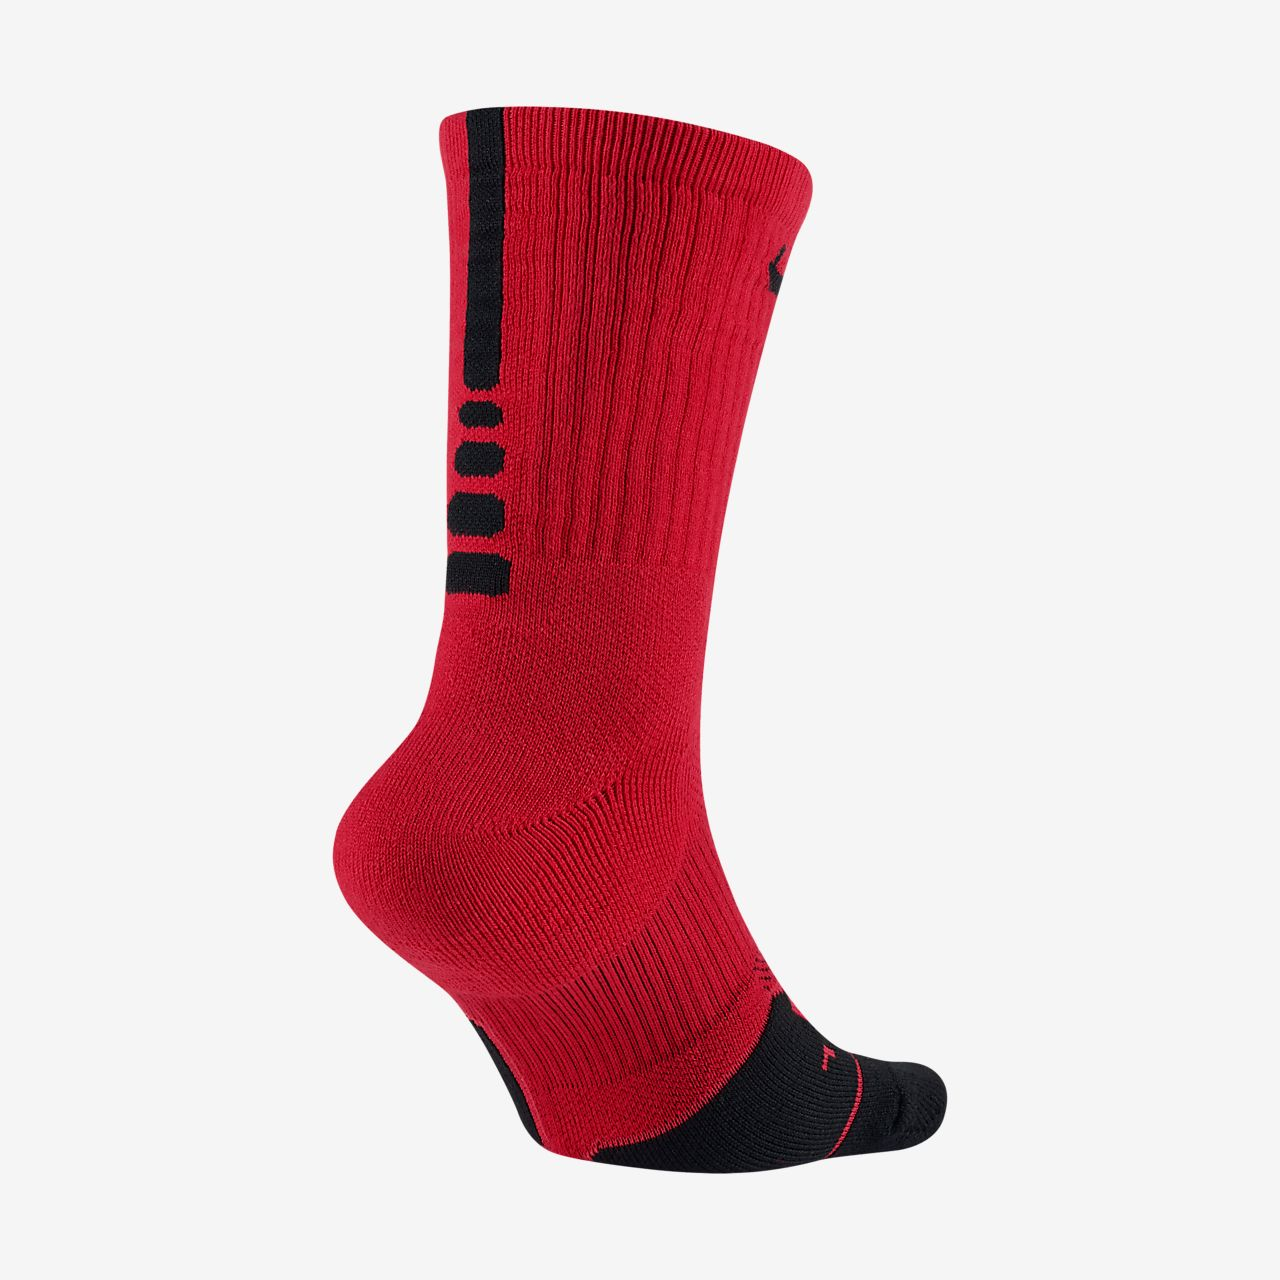 2cdbdec0e Nike Dry Elite 1.5 Crew Basketball Socks. Nike.com CH